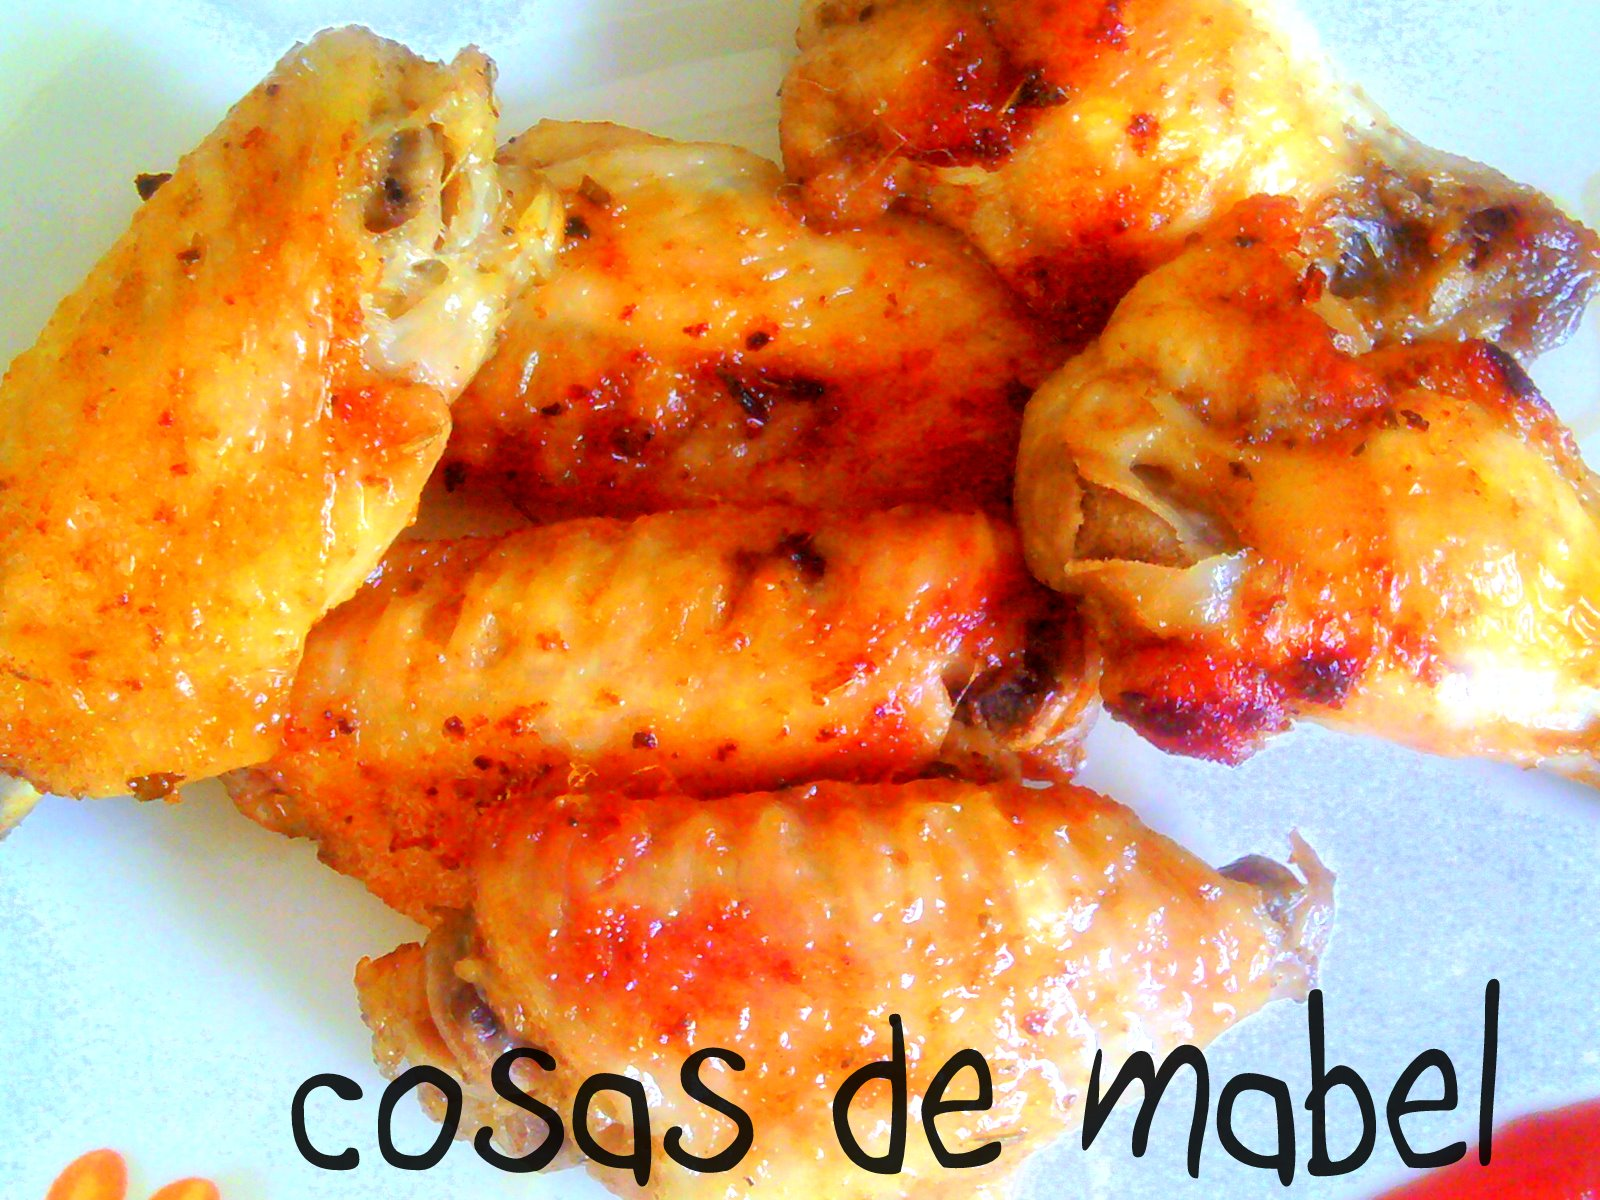 Cosas de mabel alitas de pollo en adobo - Adobo de alitas de pollo ...